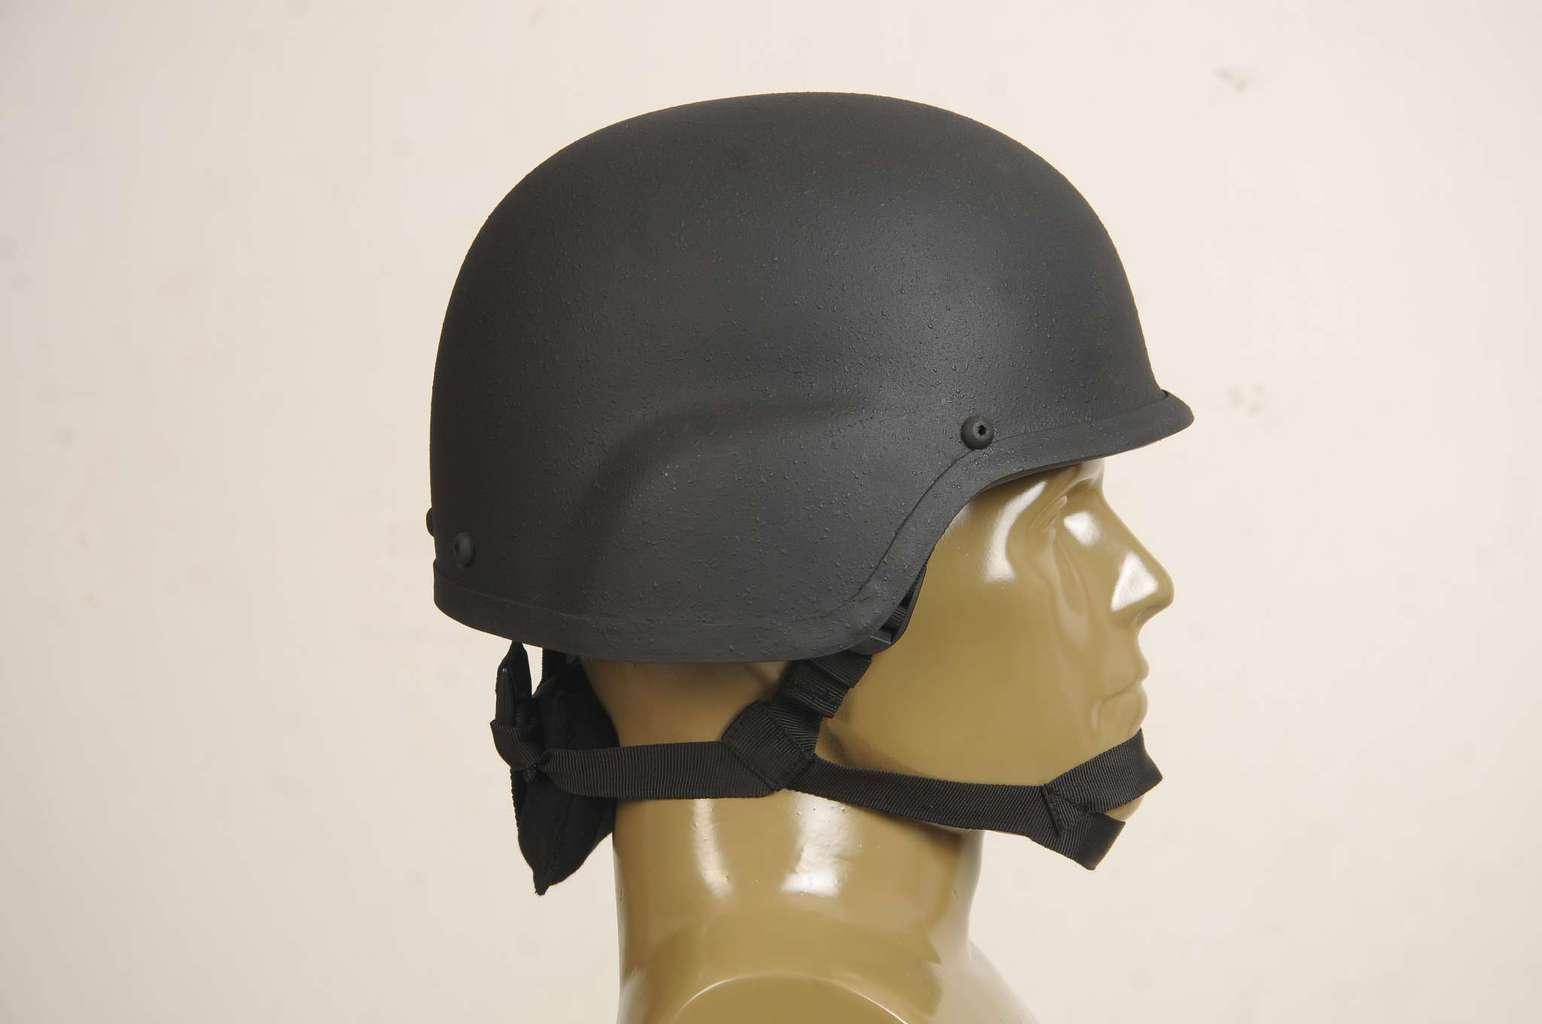 lightweight ballistic helmet in uae